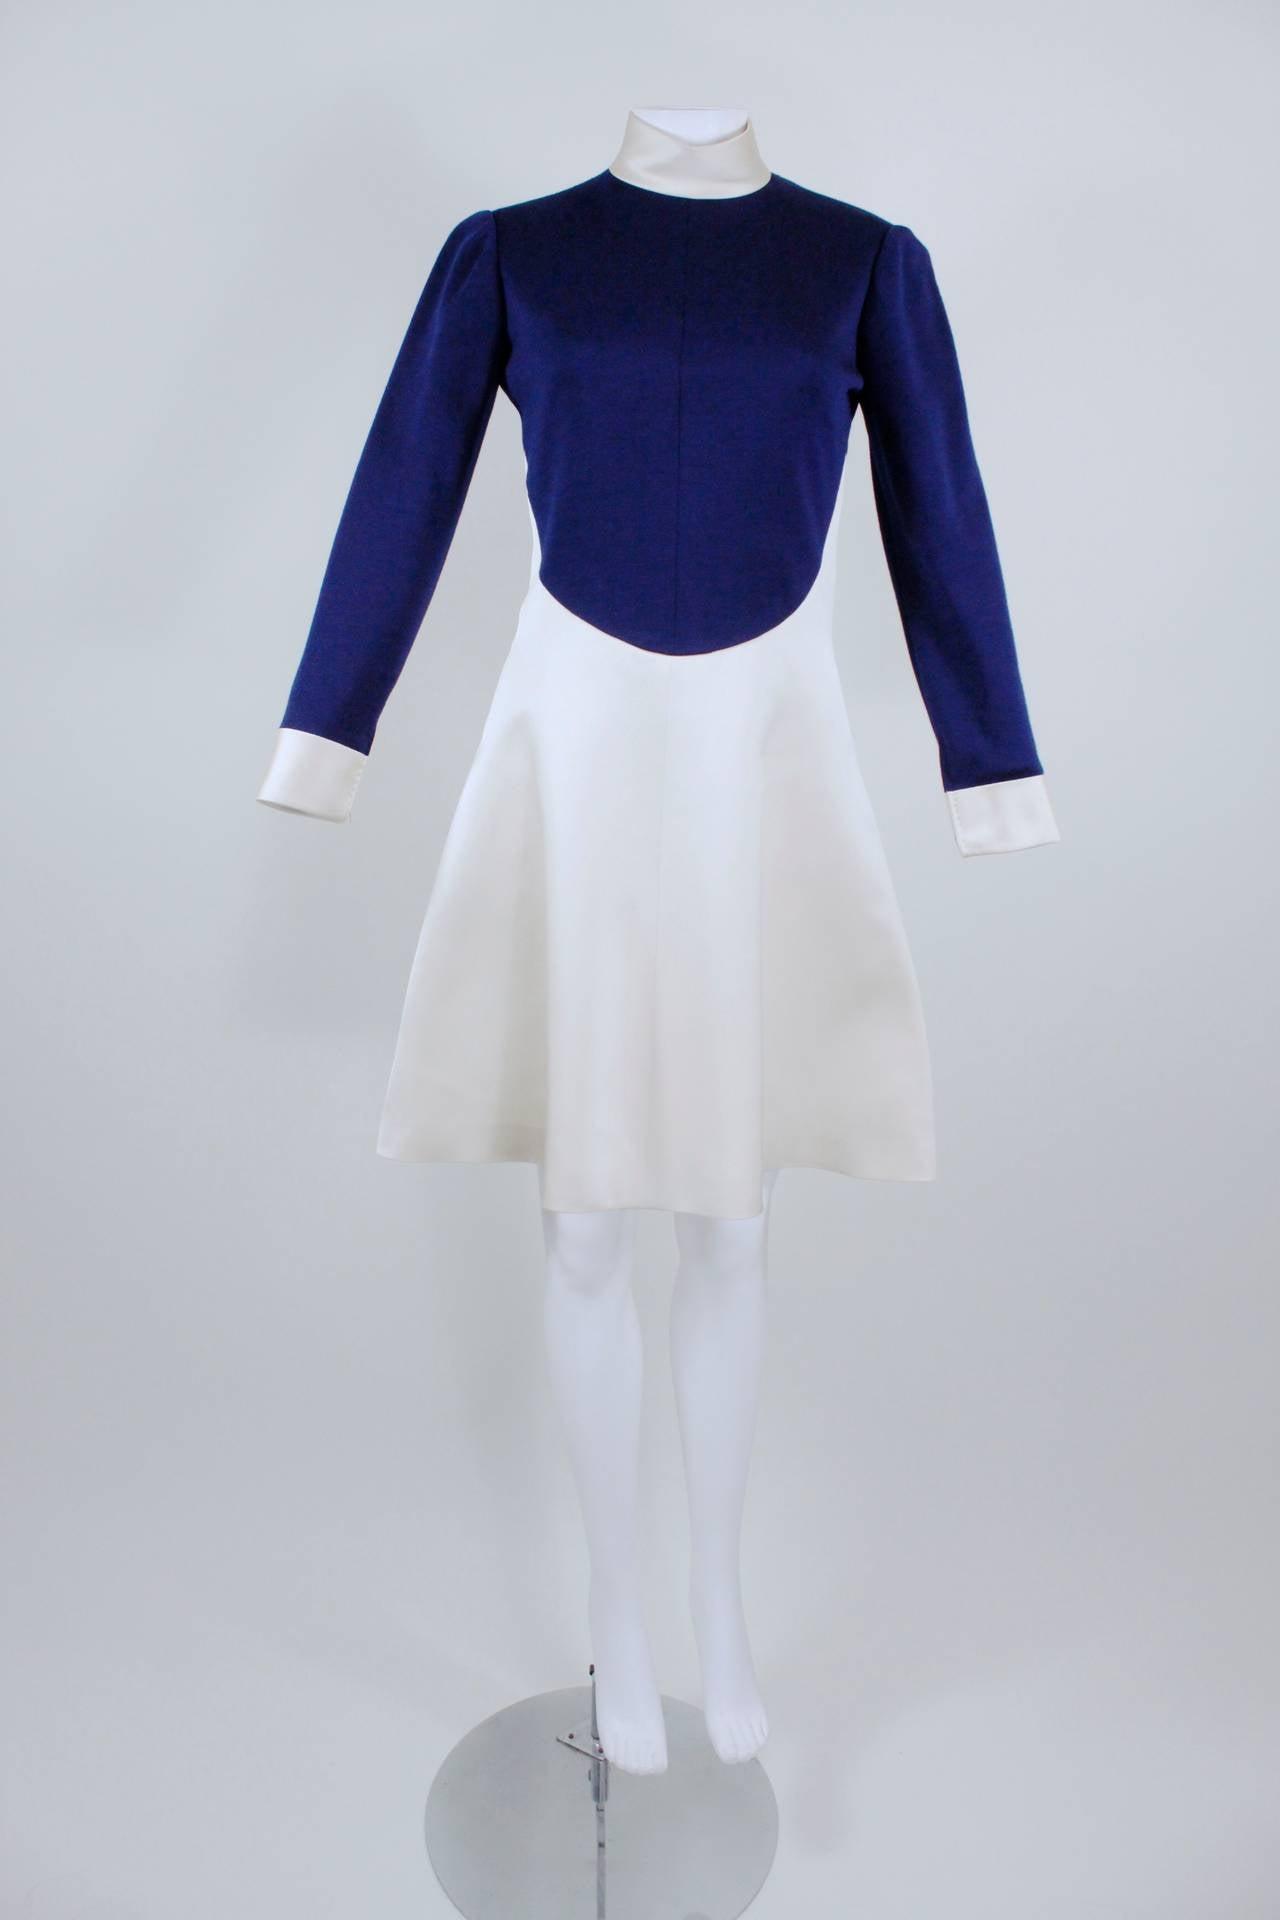 1960s Geoffrey Beene Navy Wool and Eggshell Mod Dress 2